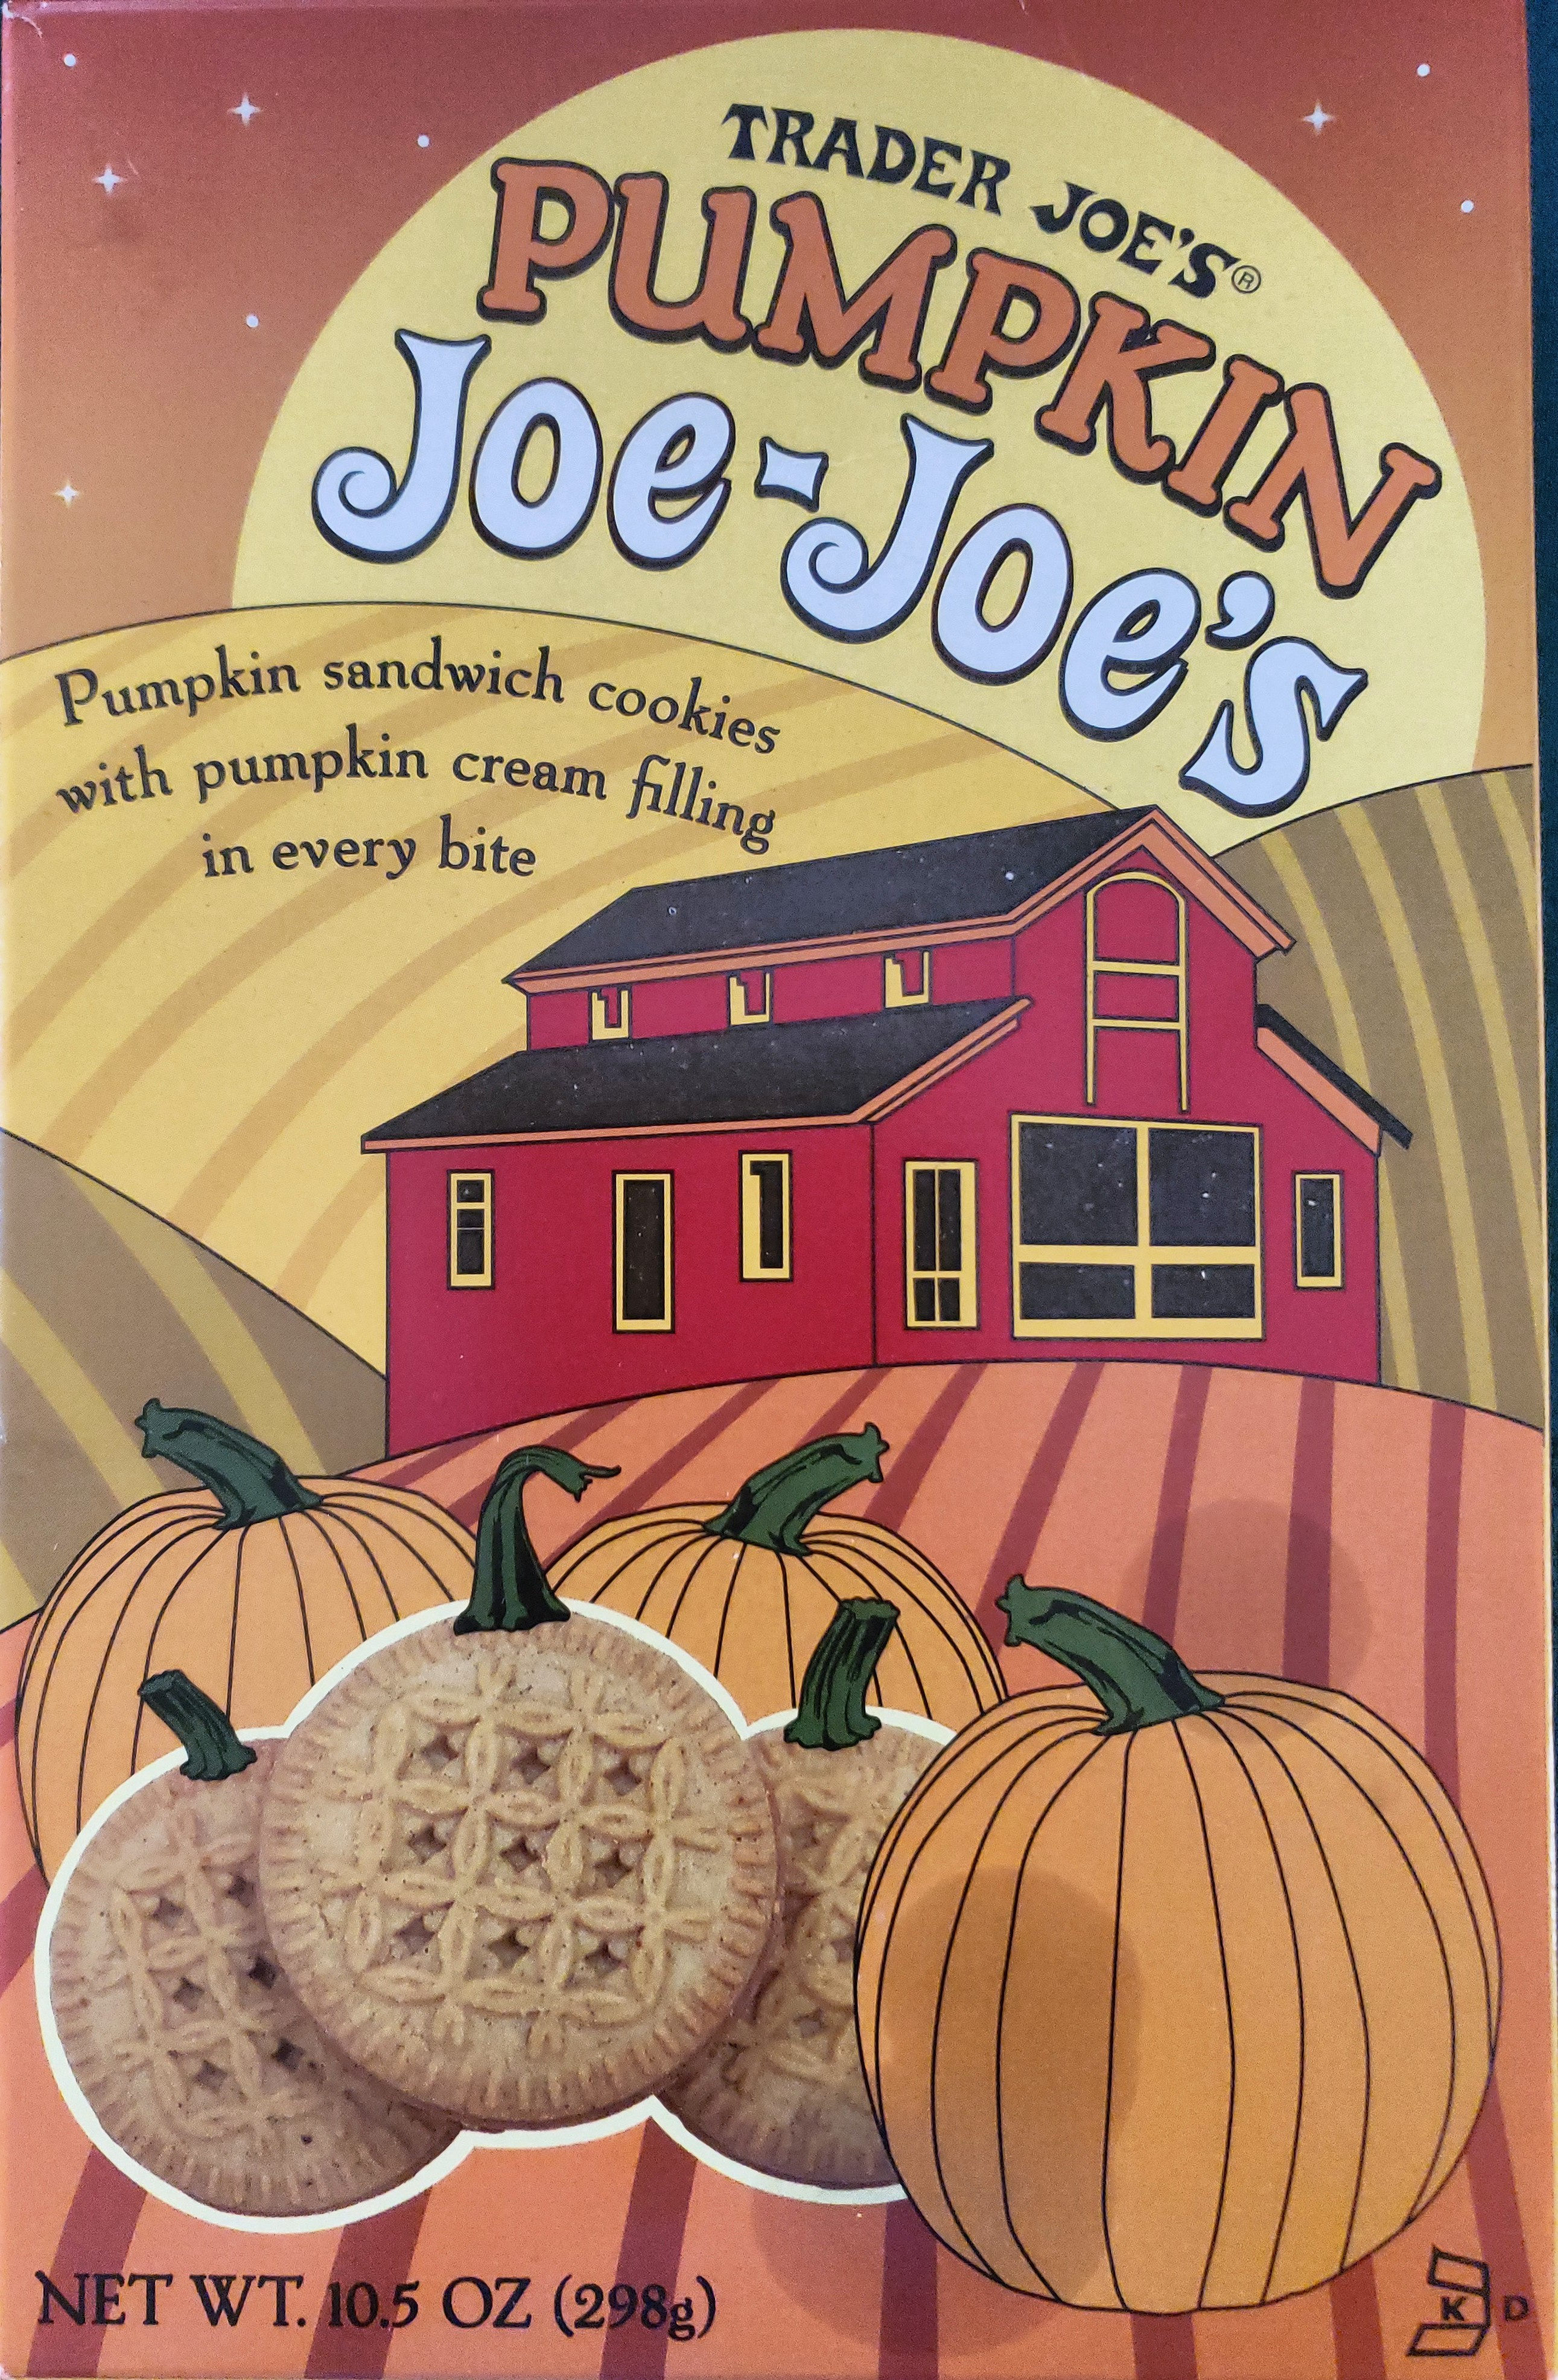 Pumpkin Joe-Joe's - Product - en